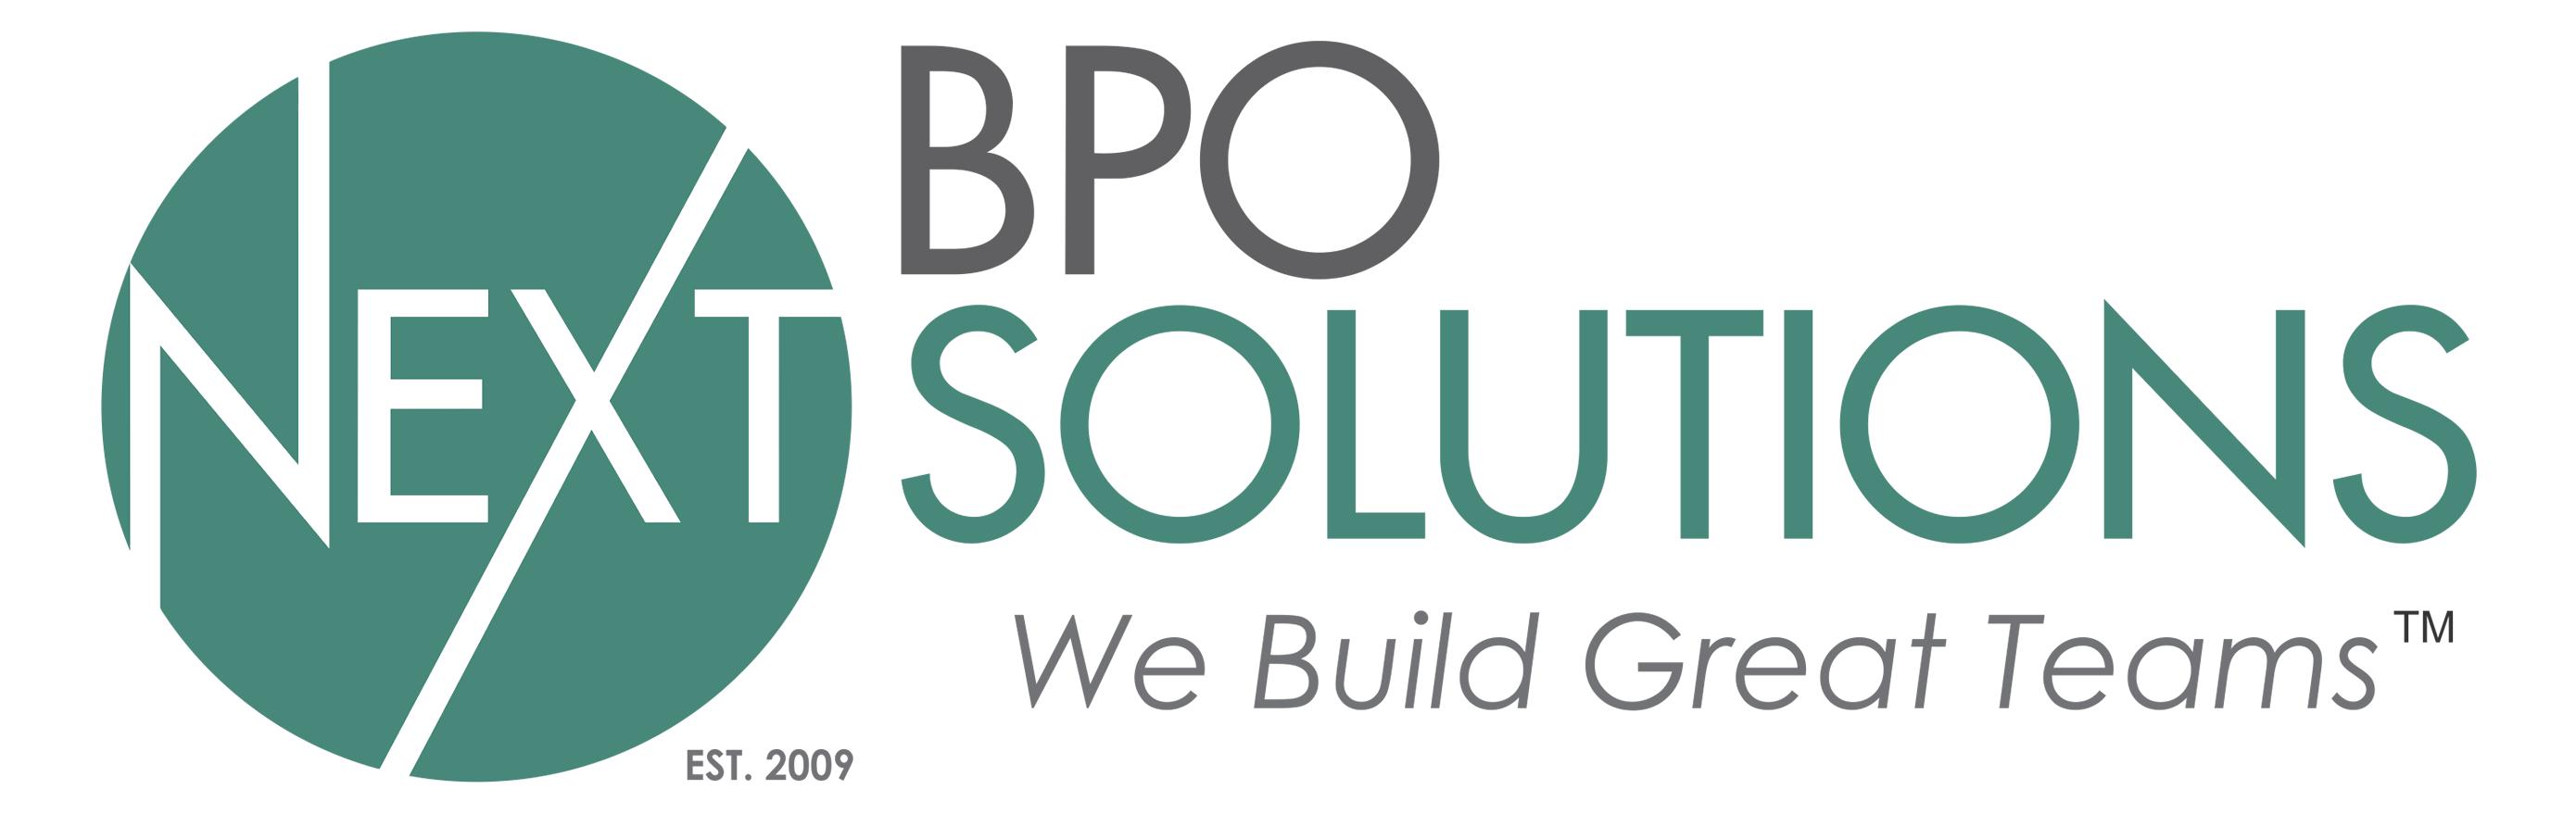 Next BPO Solutions